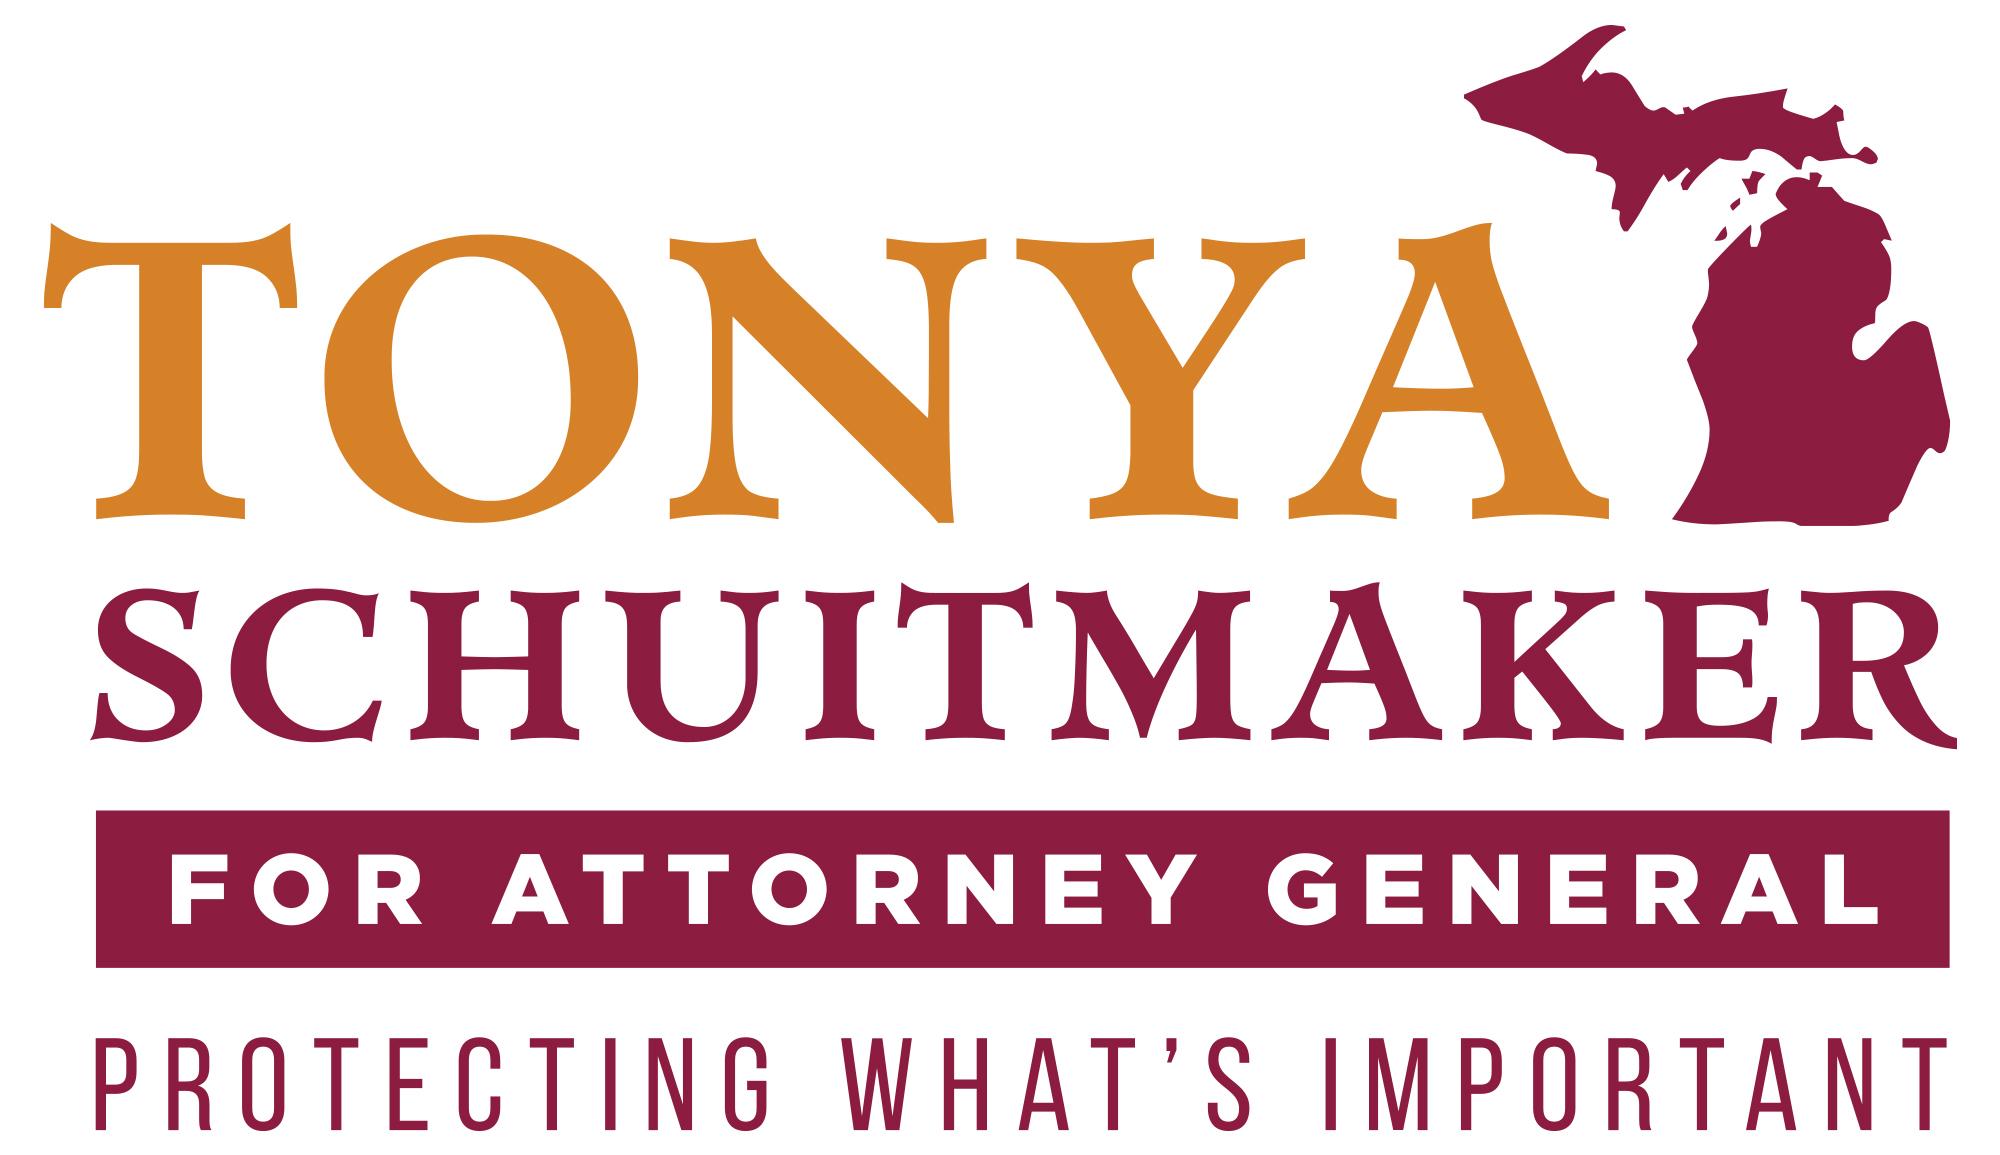 Tonya_Schuitmaker_logo.png